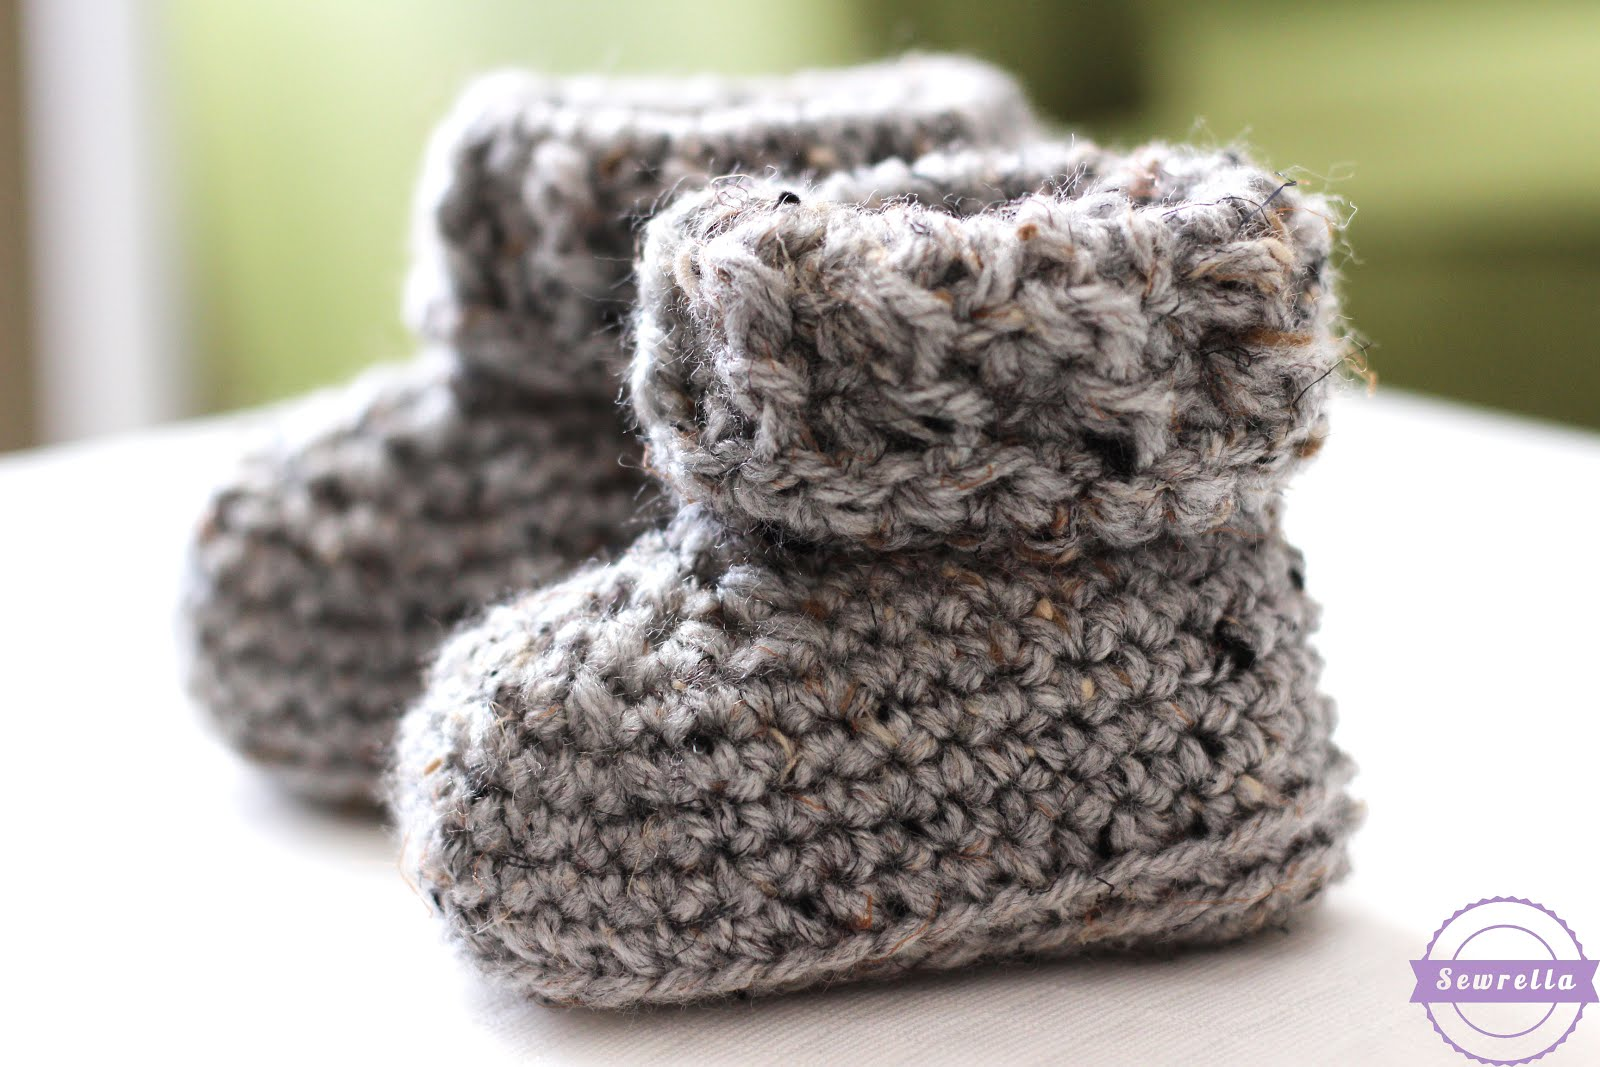 e17e3d37e The Parker Crochet Baby Booties - Sewrella